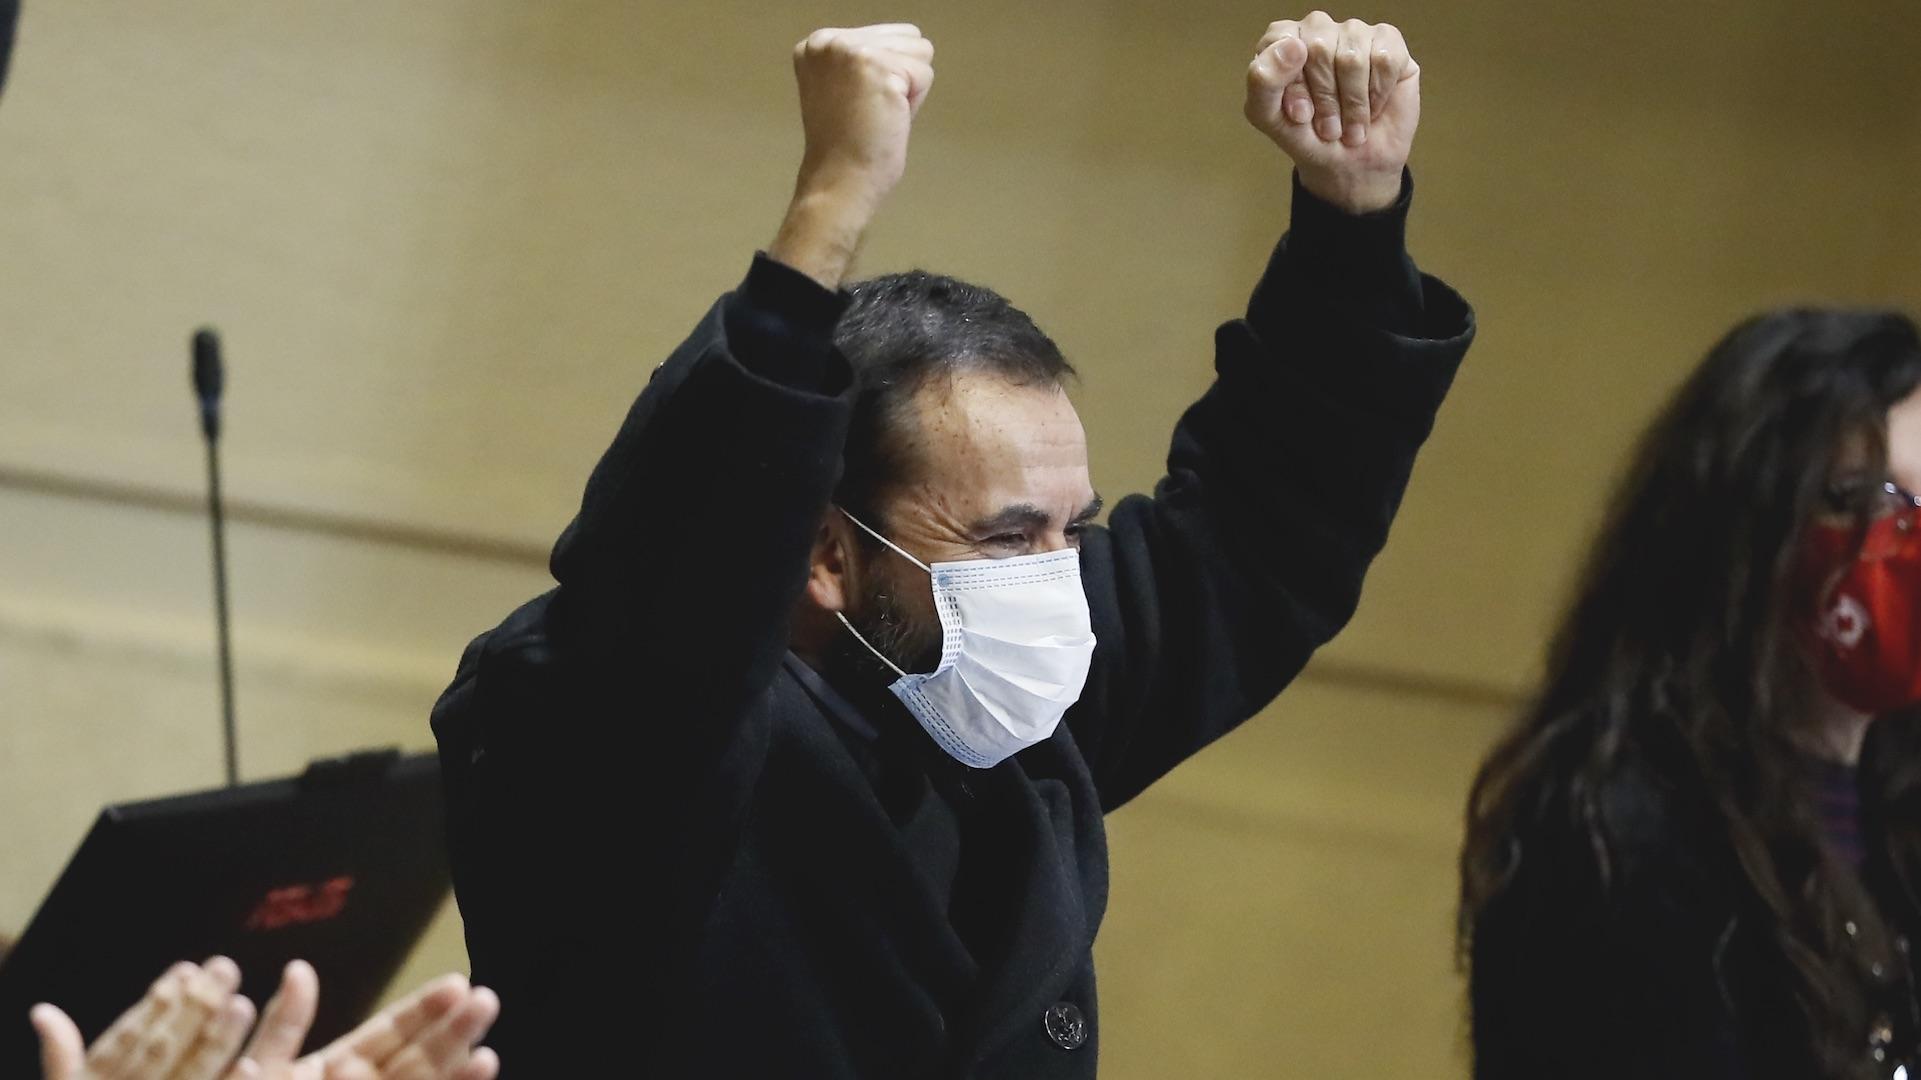 Fiscalía inicia investigación por polémico control del diputado Gutiérrez